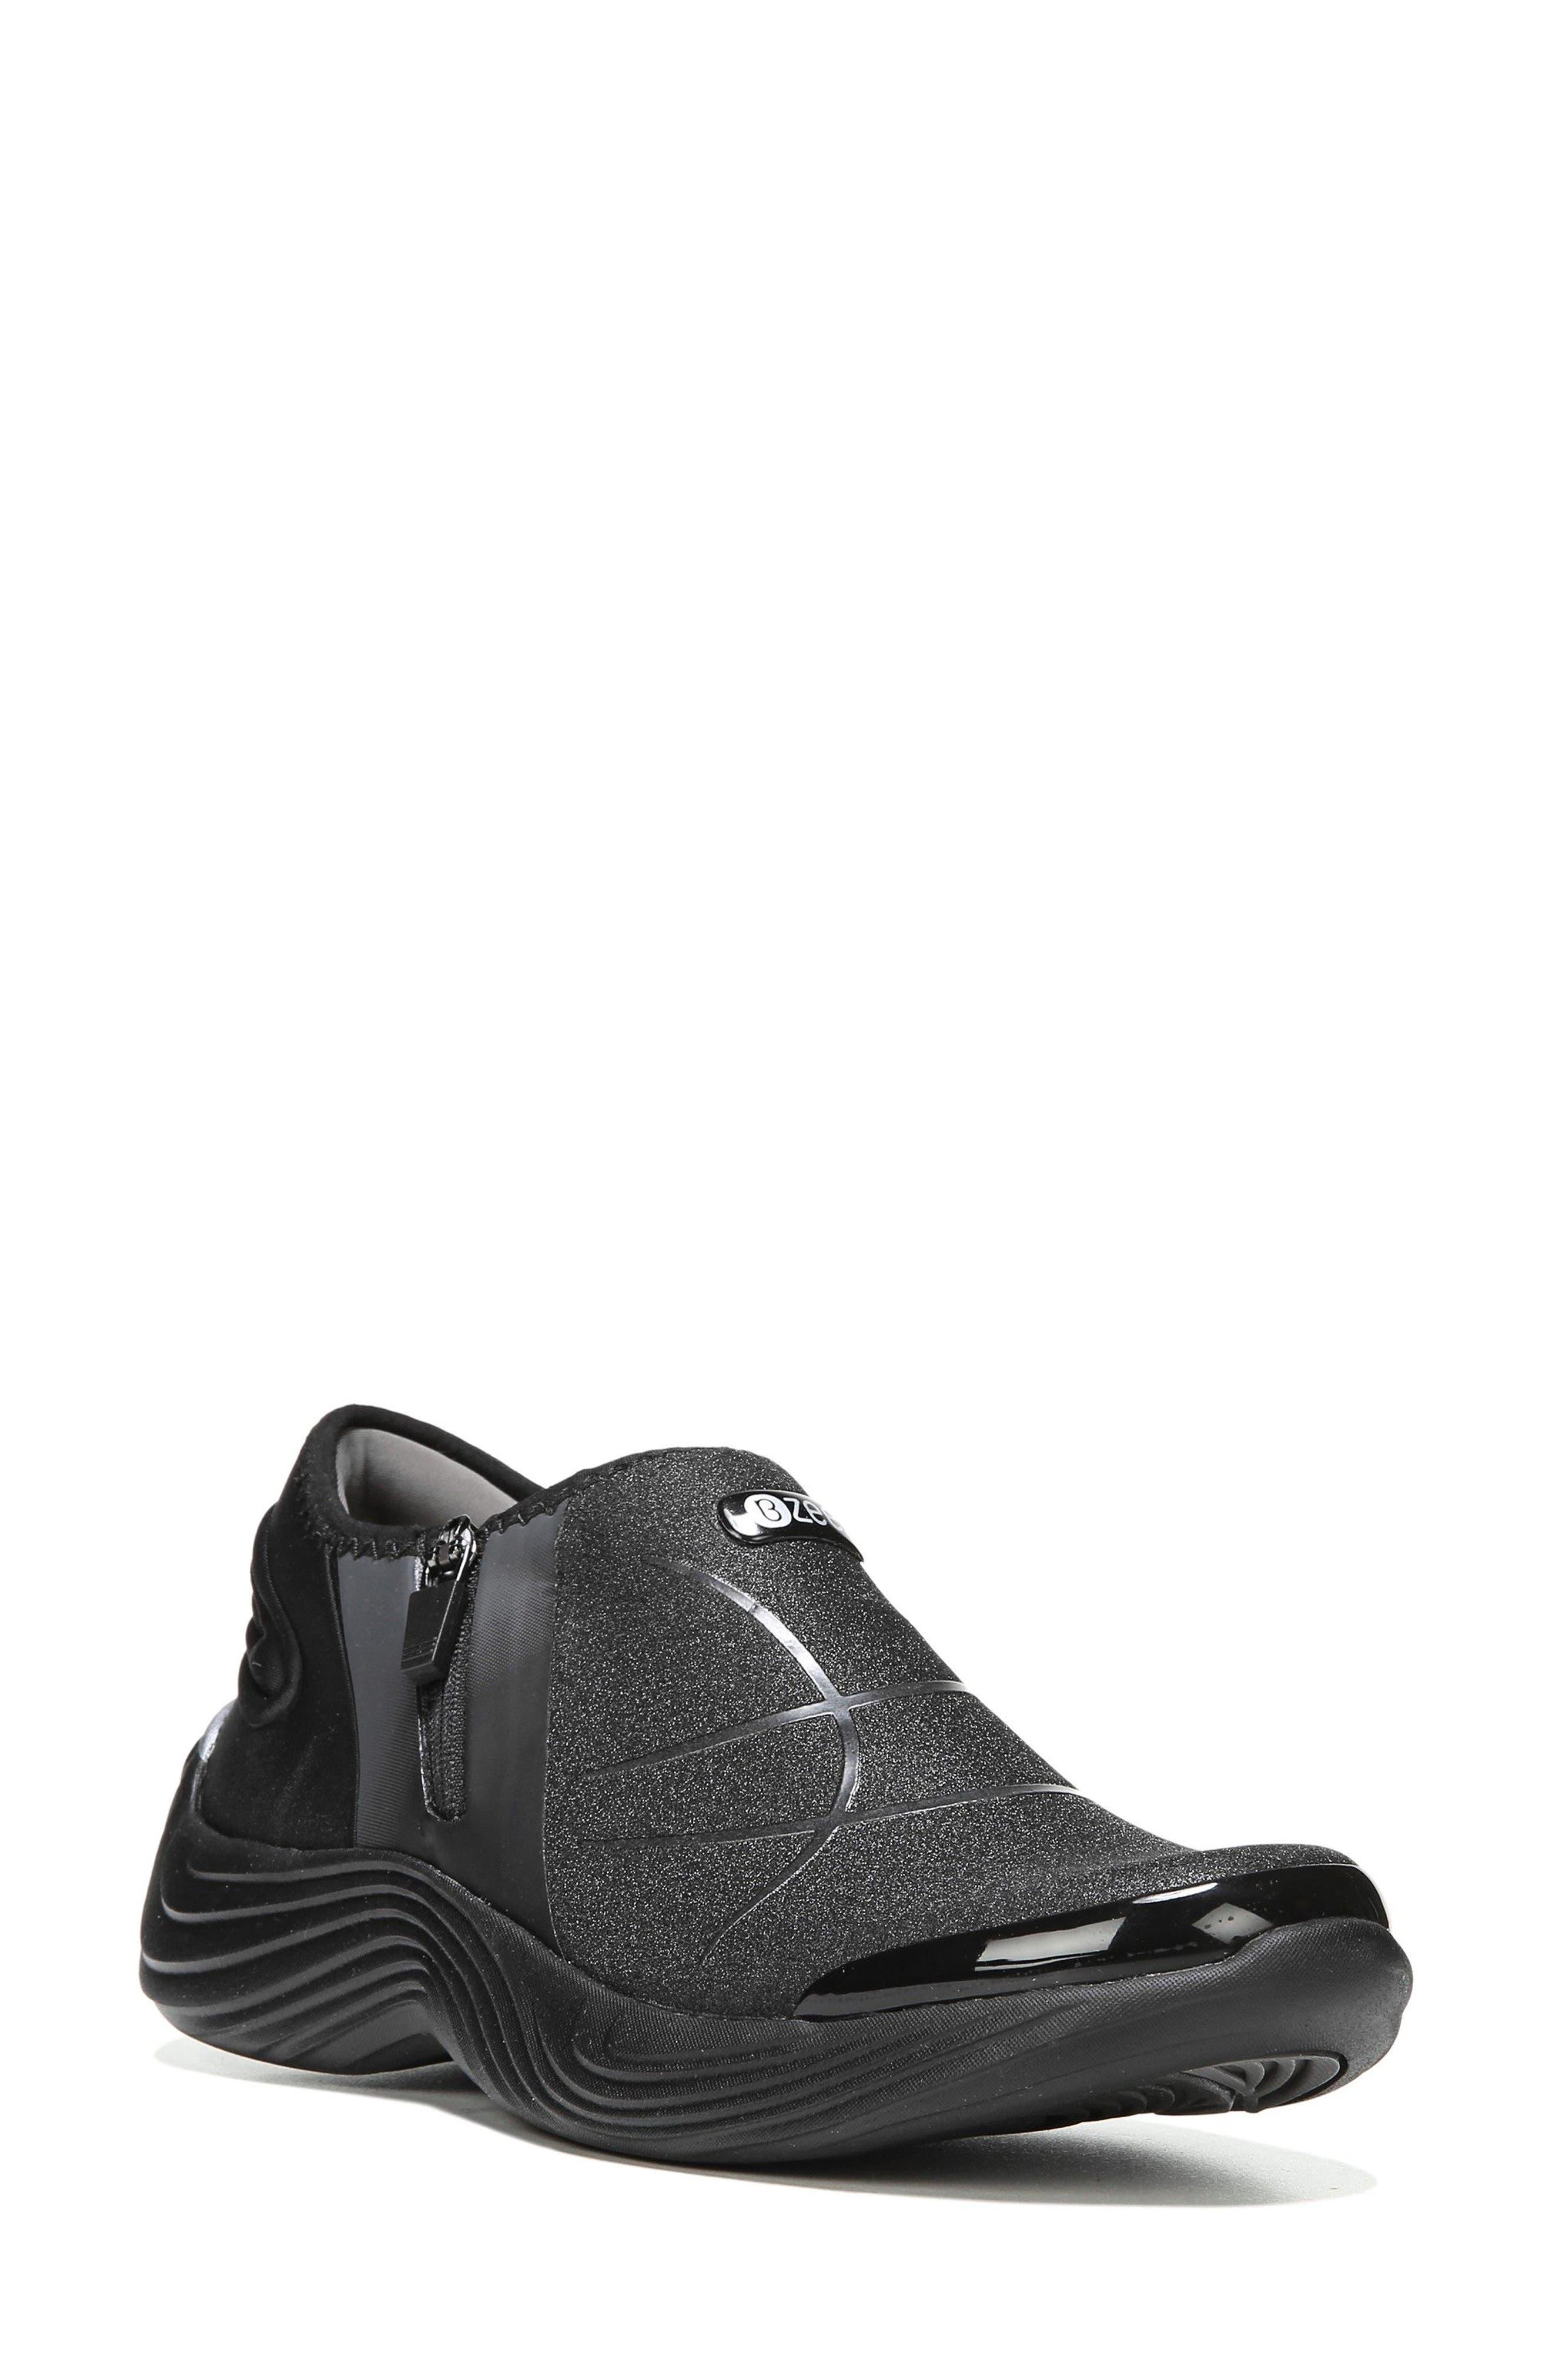 Trilogy Slip-On Sneaker,                             Main thumbnail 1, color,                             001